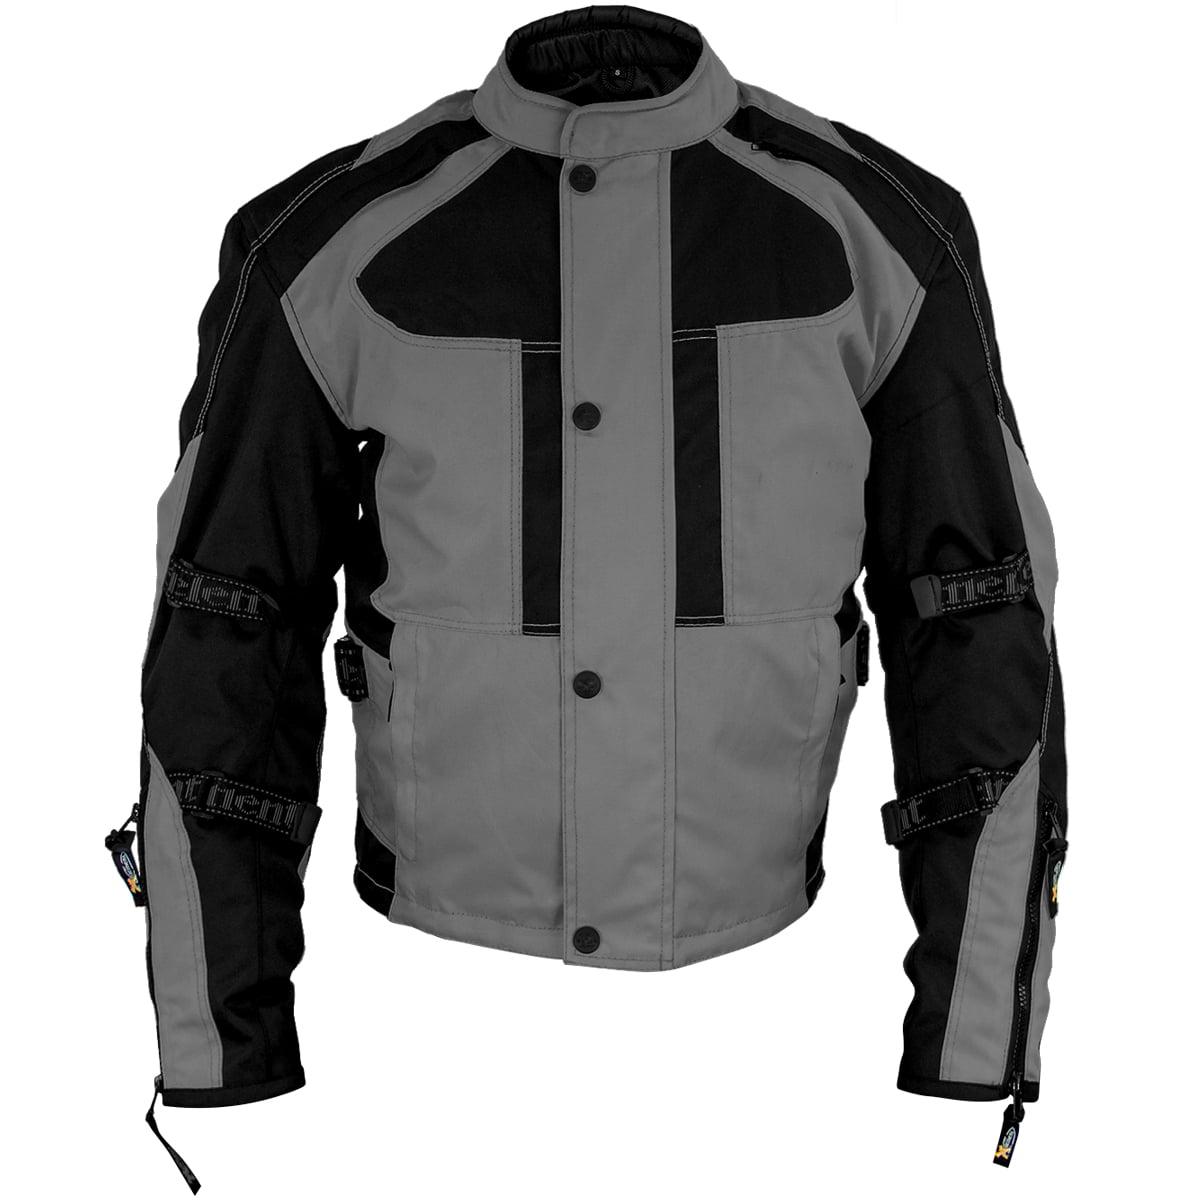 Xelement XS3005 Momentum Mens Black/Grey Tri-Tex Armored Motorcycle Jacket